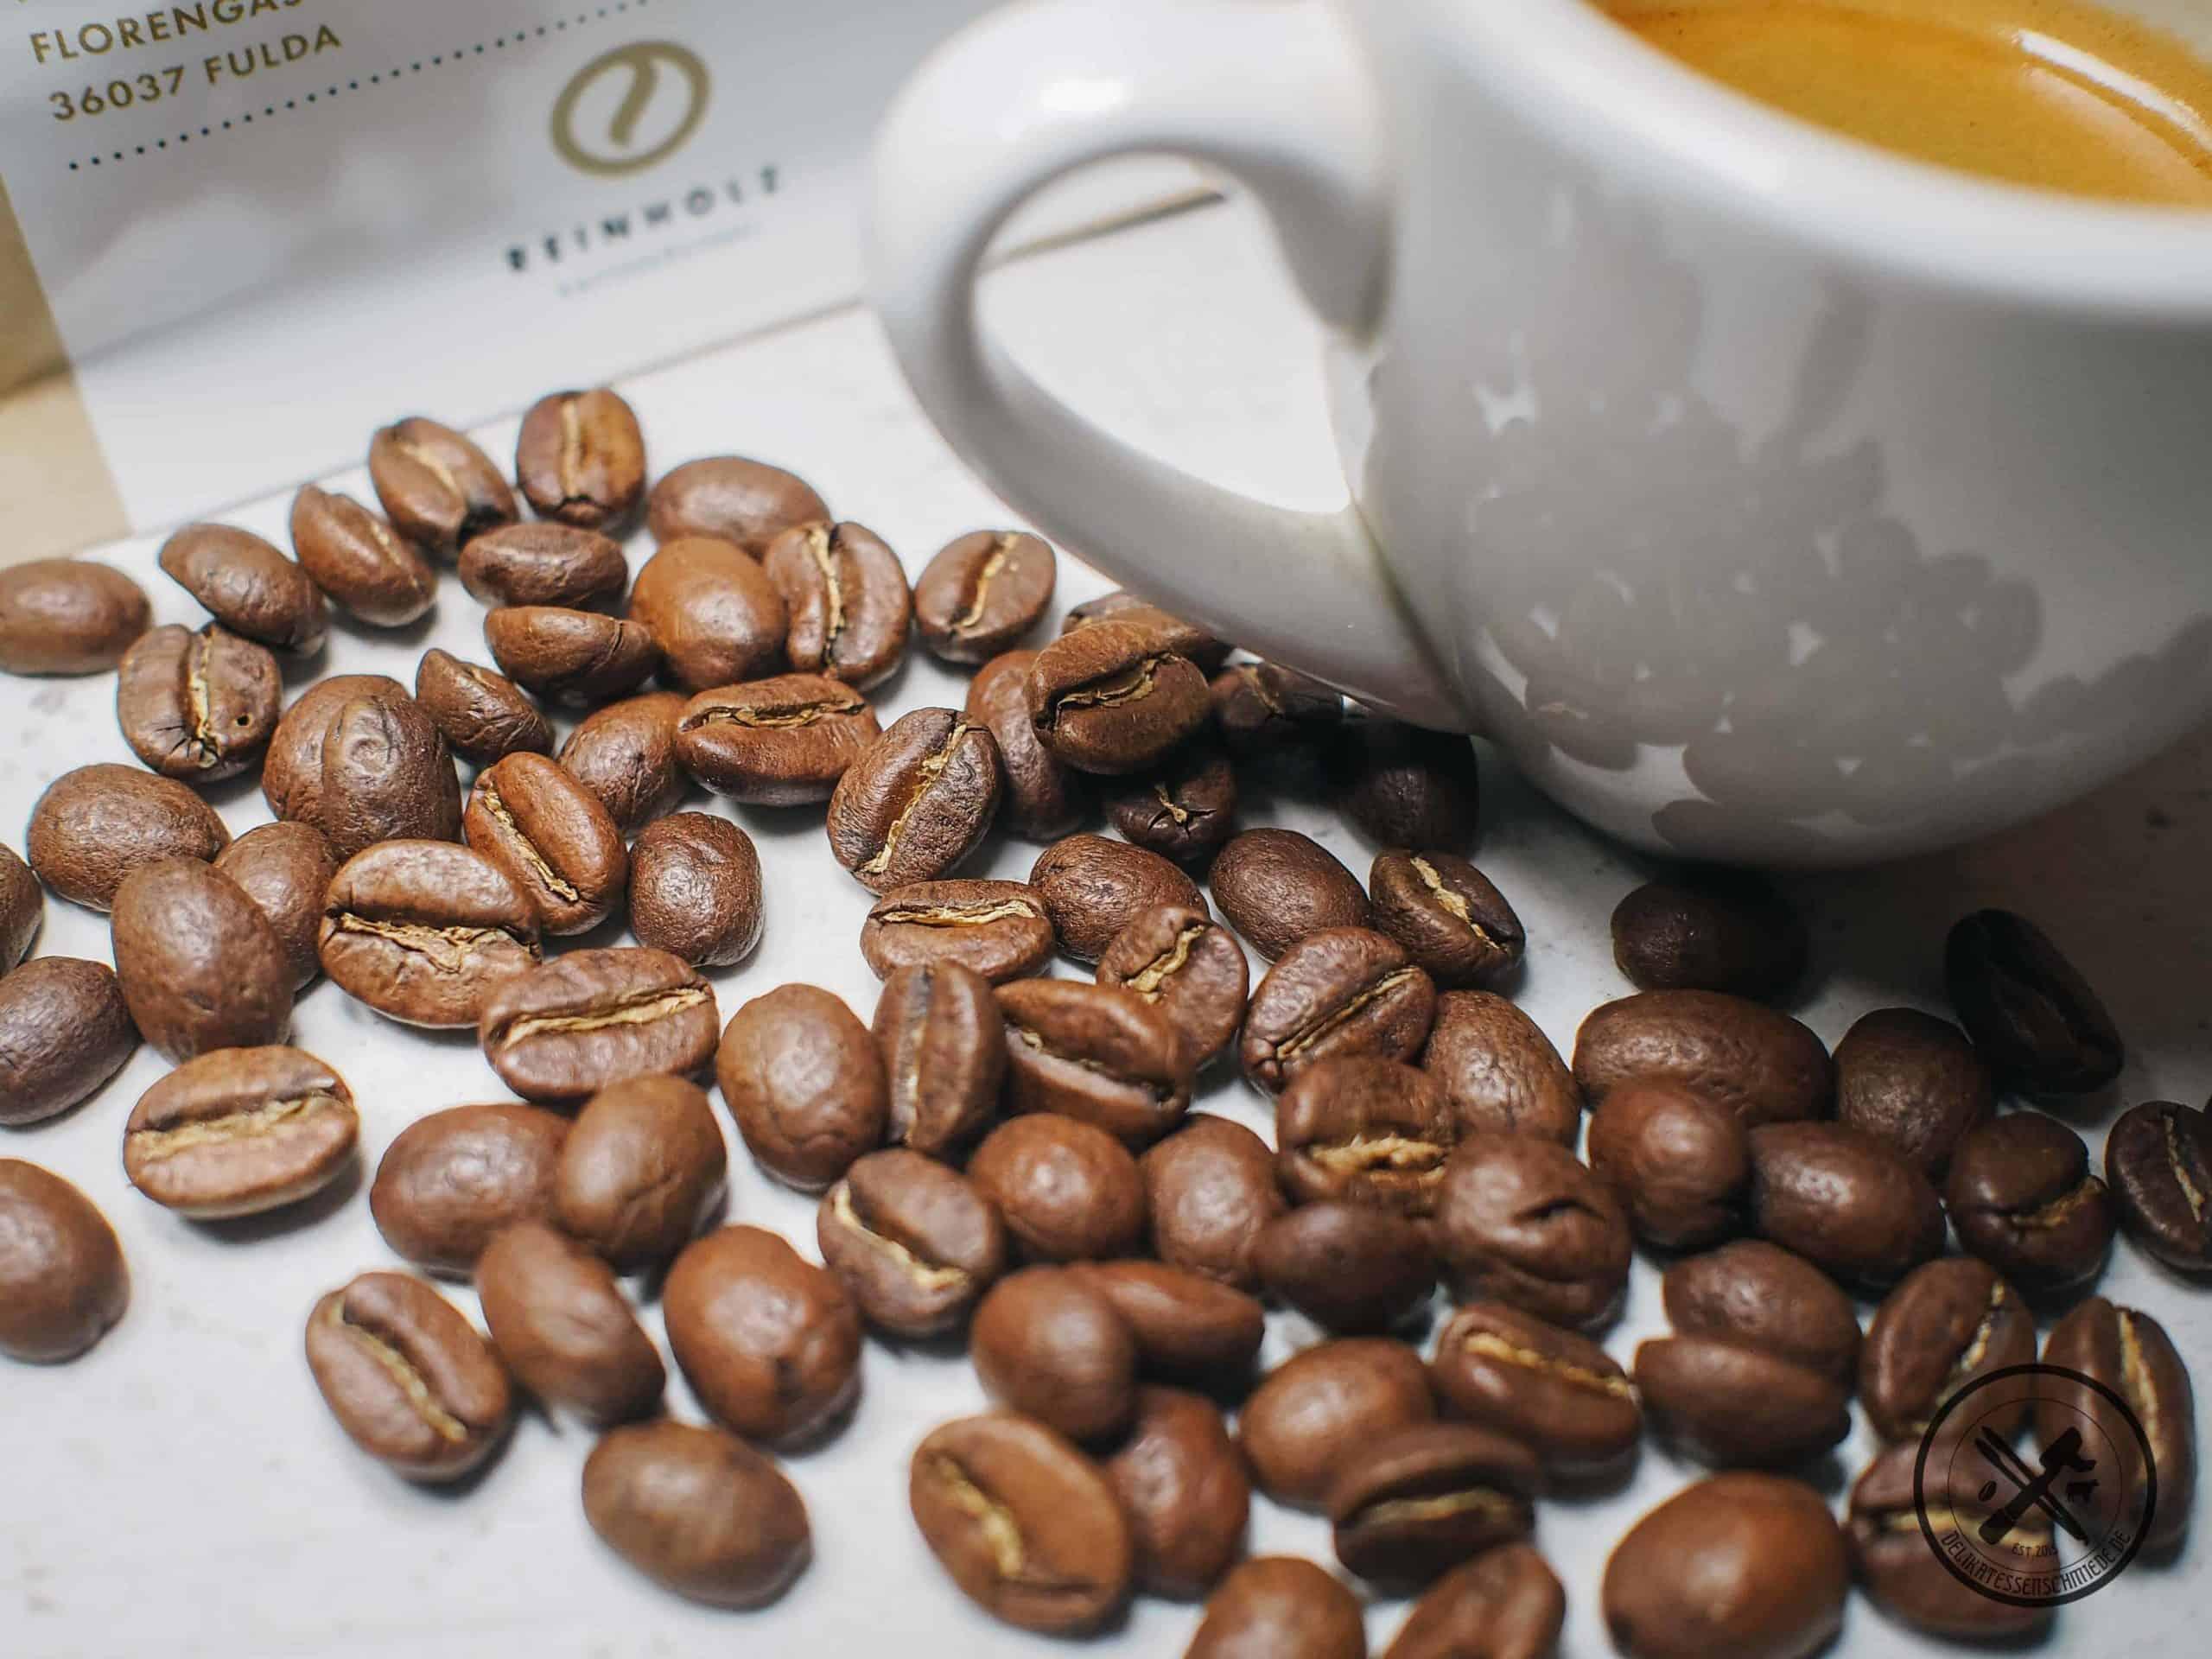 Burgen_Kaffee-1